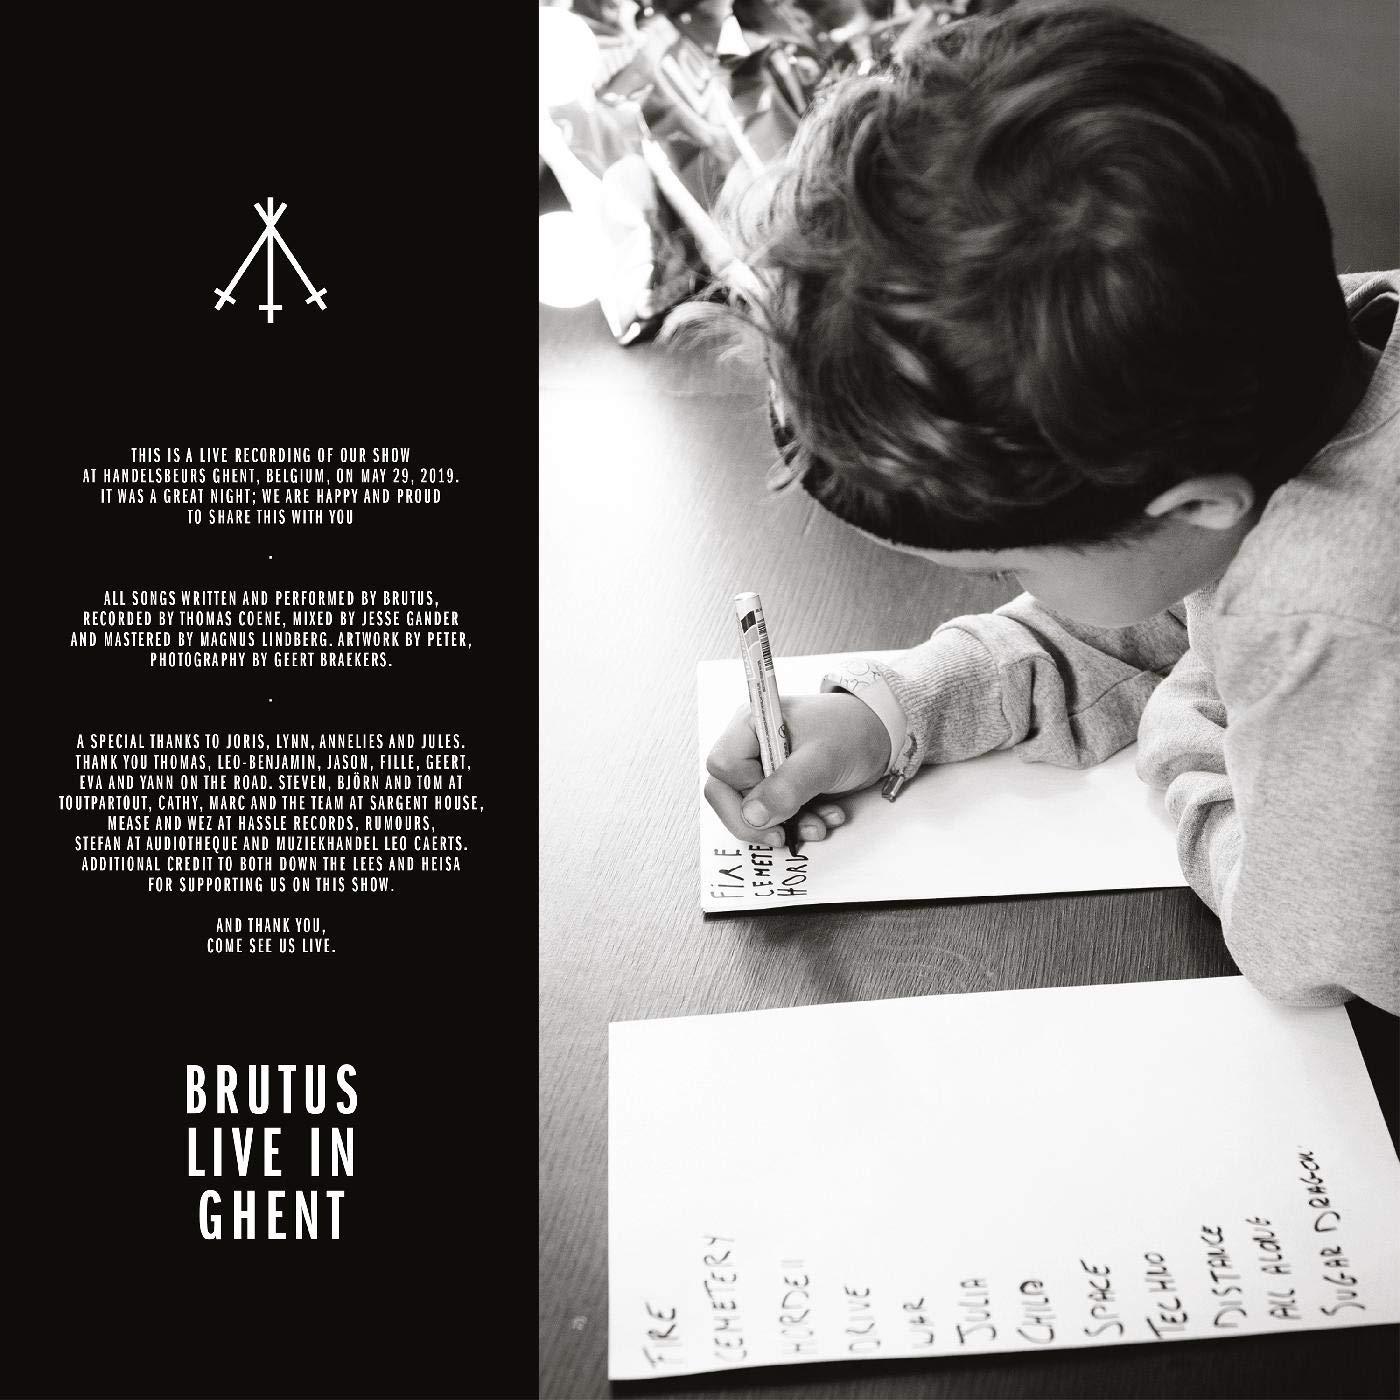 Brutus - Live In Ghent [2xLP]